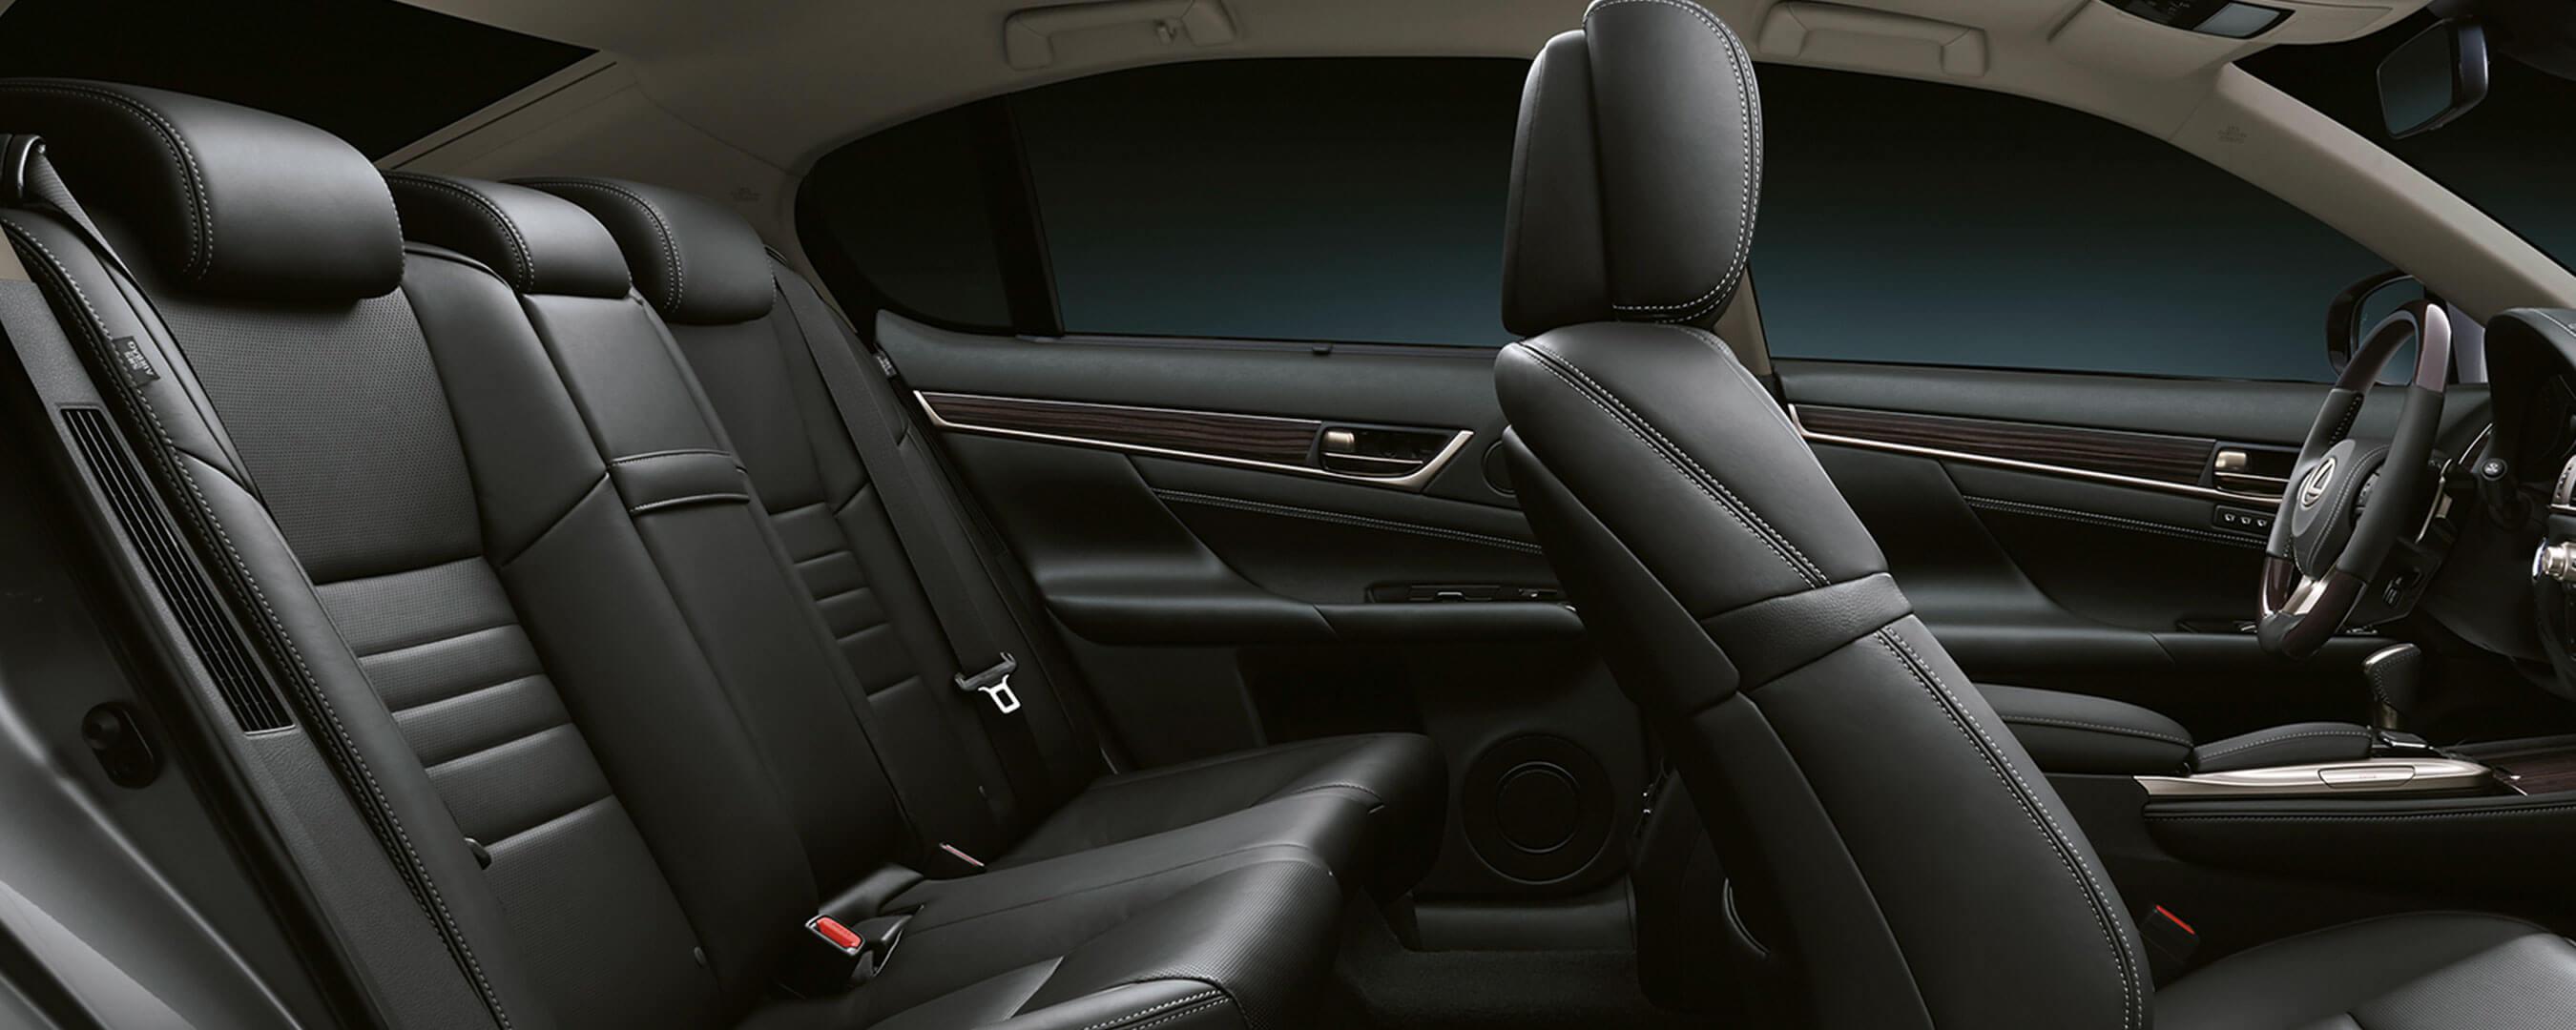 2017 lexus gs 450h experience hero interior back